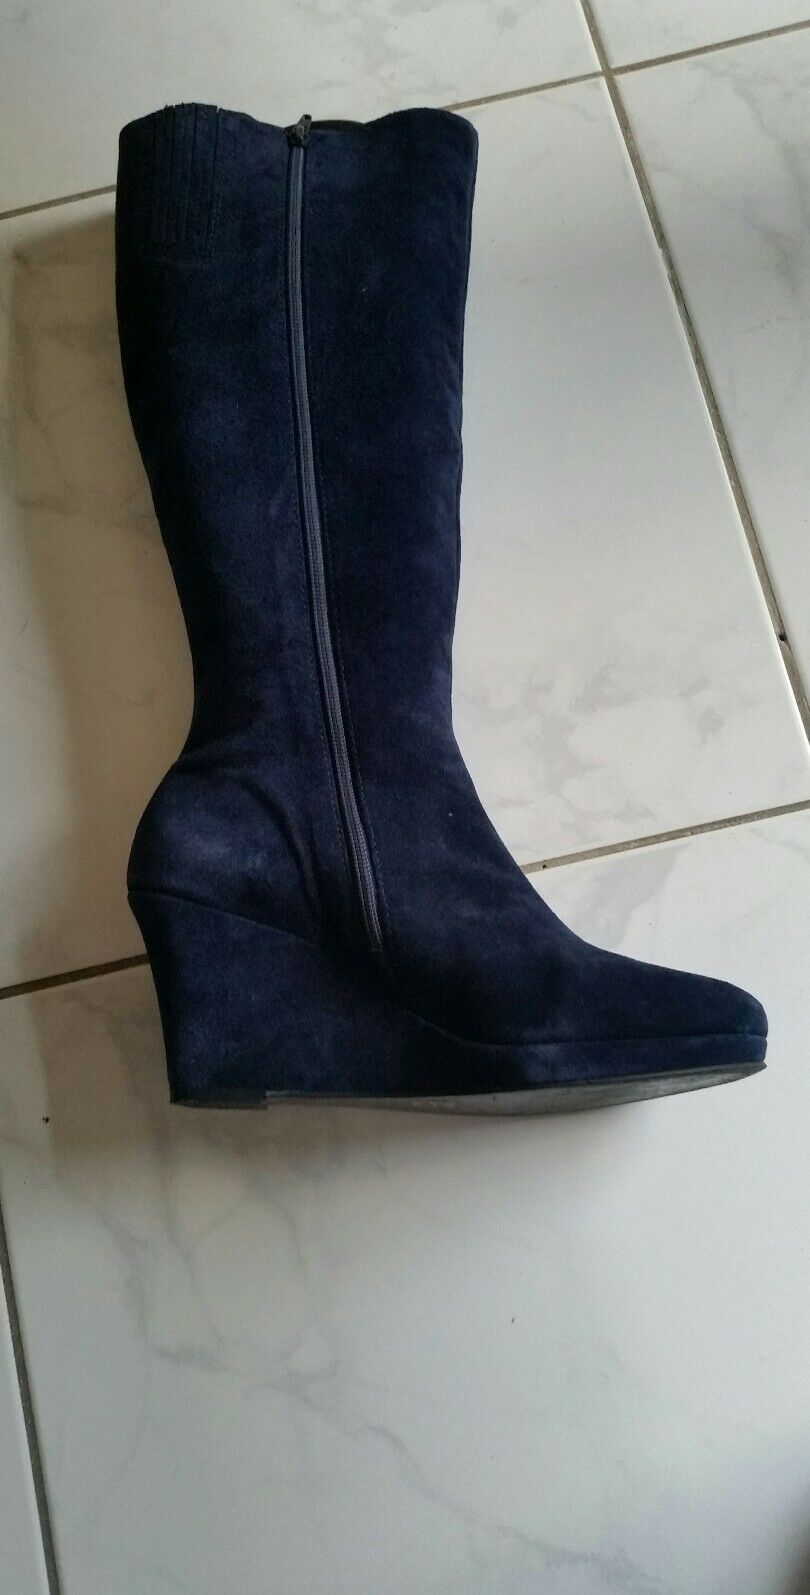 Ragazzi Milano Blau Damen Stiefel Gr 42 Blau Milano Nubukleder wNeu e8da67